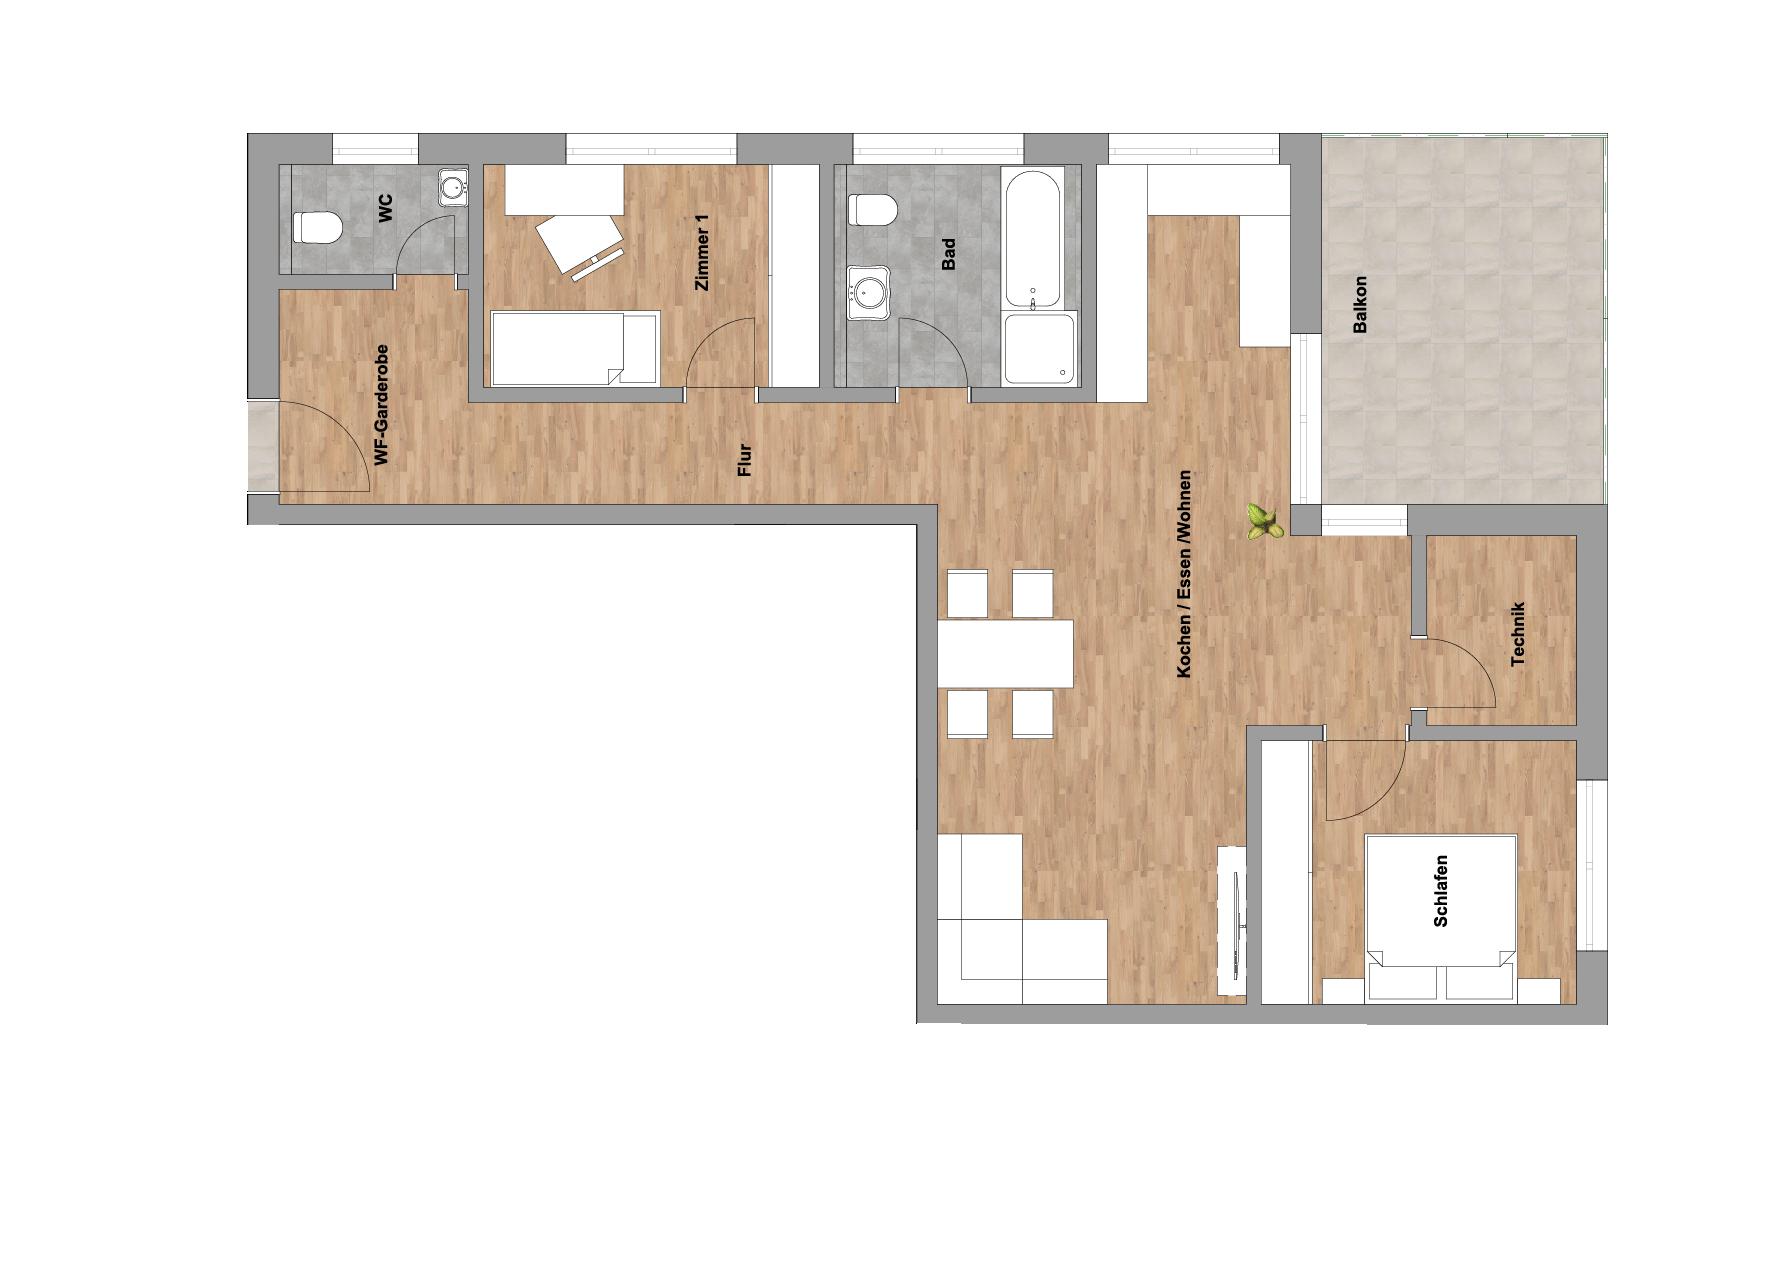 infoScout Neubau Projekt Ittersbach Wohnung 5